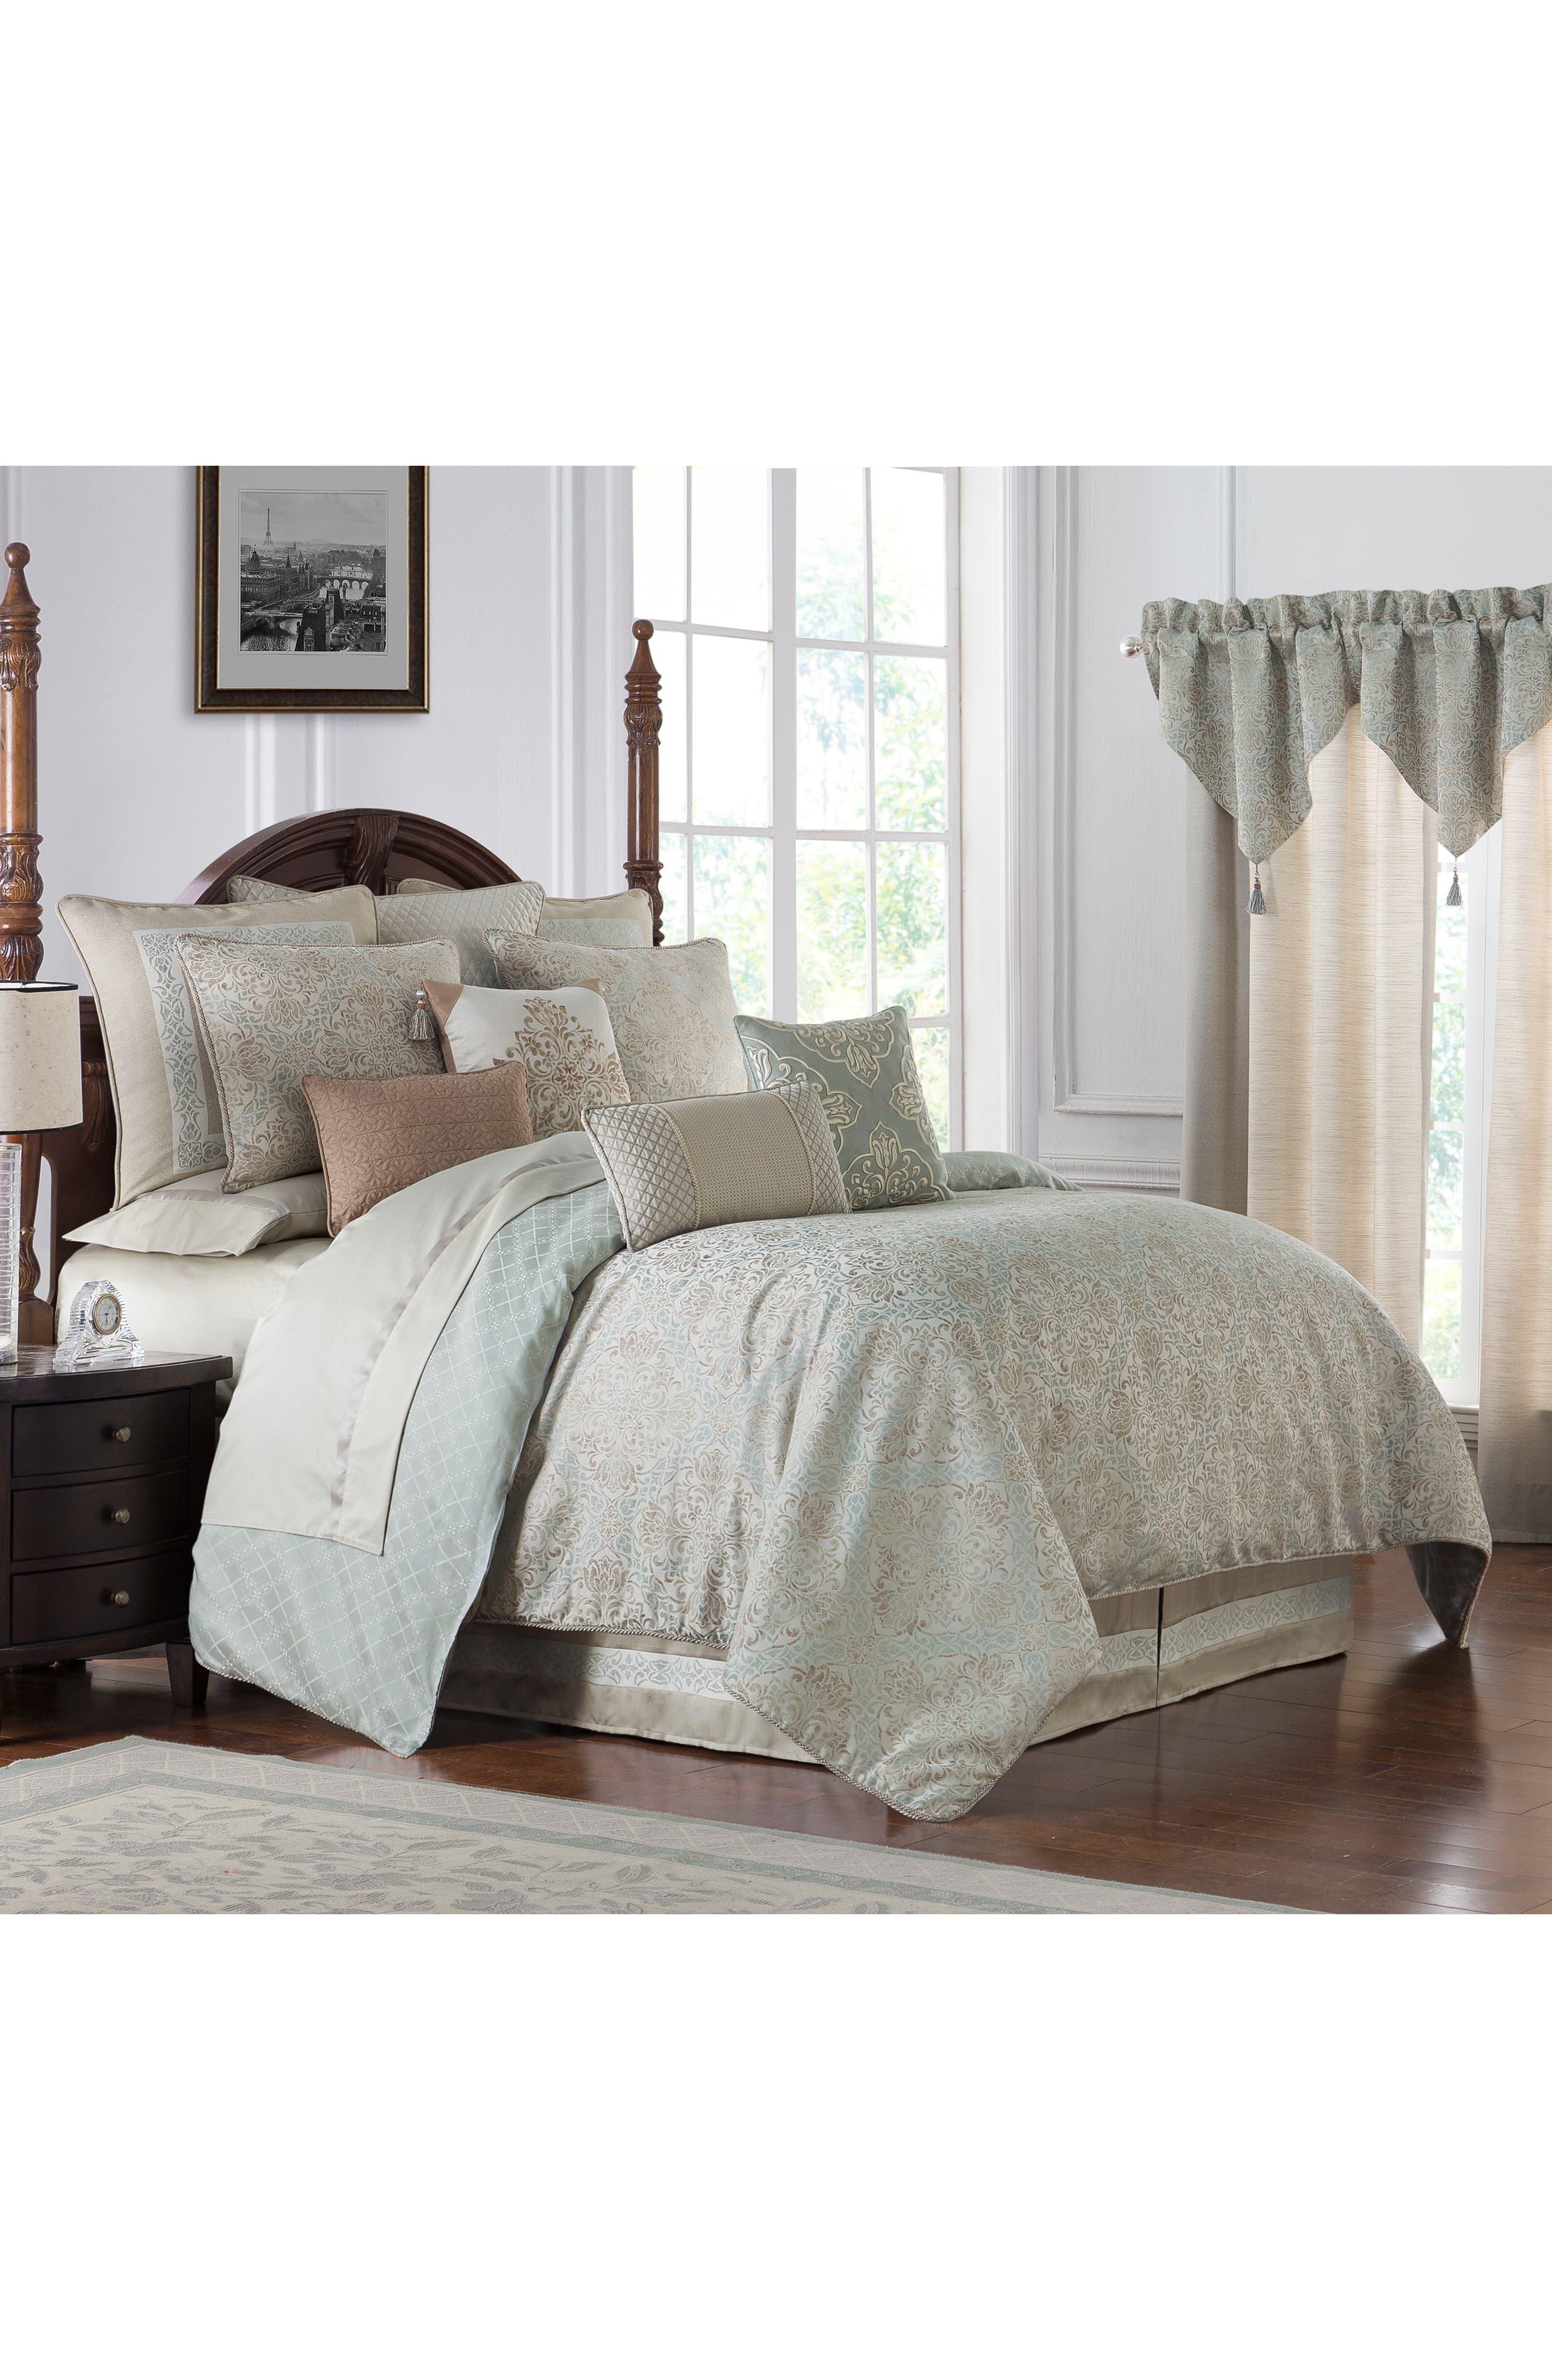 Gwyneth Reversible Comforter, Sham & Bedskirt Set,                             Alternate thumbnail 8, color,                             PALE BLUE